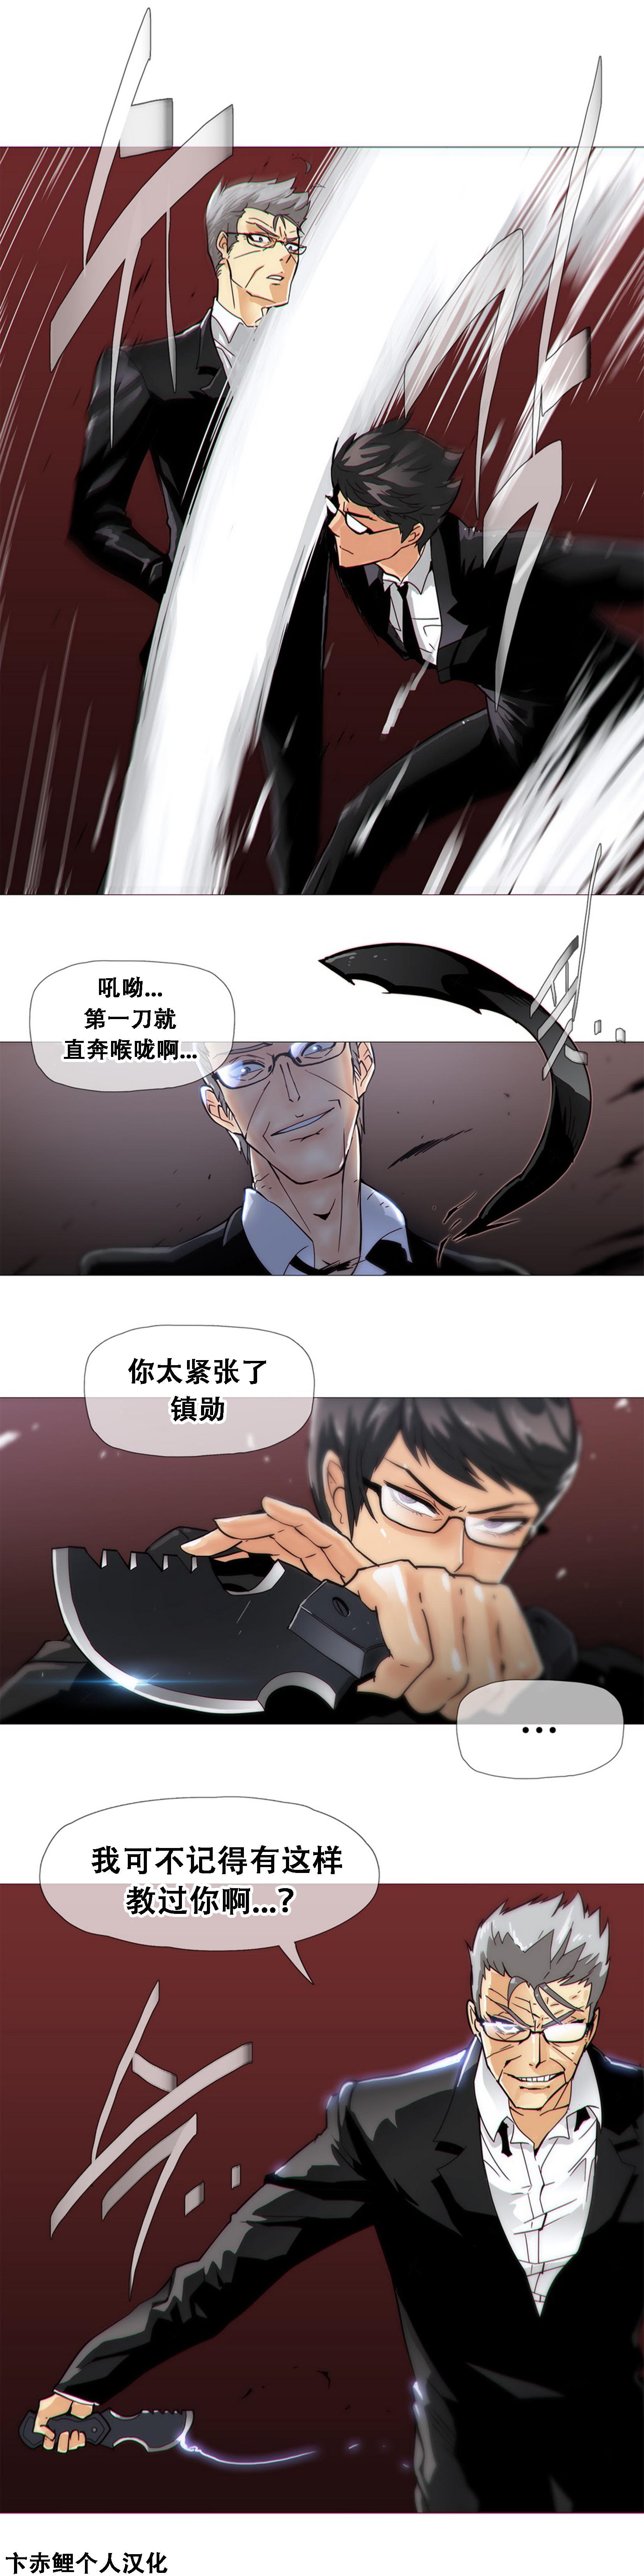 HouseHold Affairs 【卞赤鲤个人汉化】1~21话(持续更新中) 353